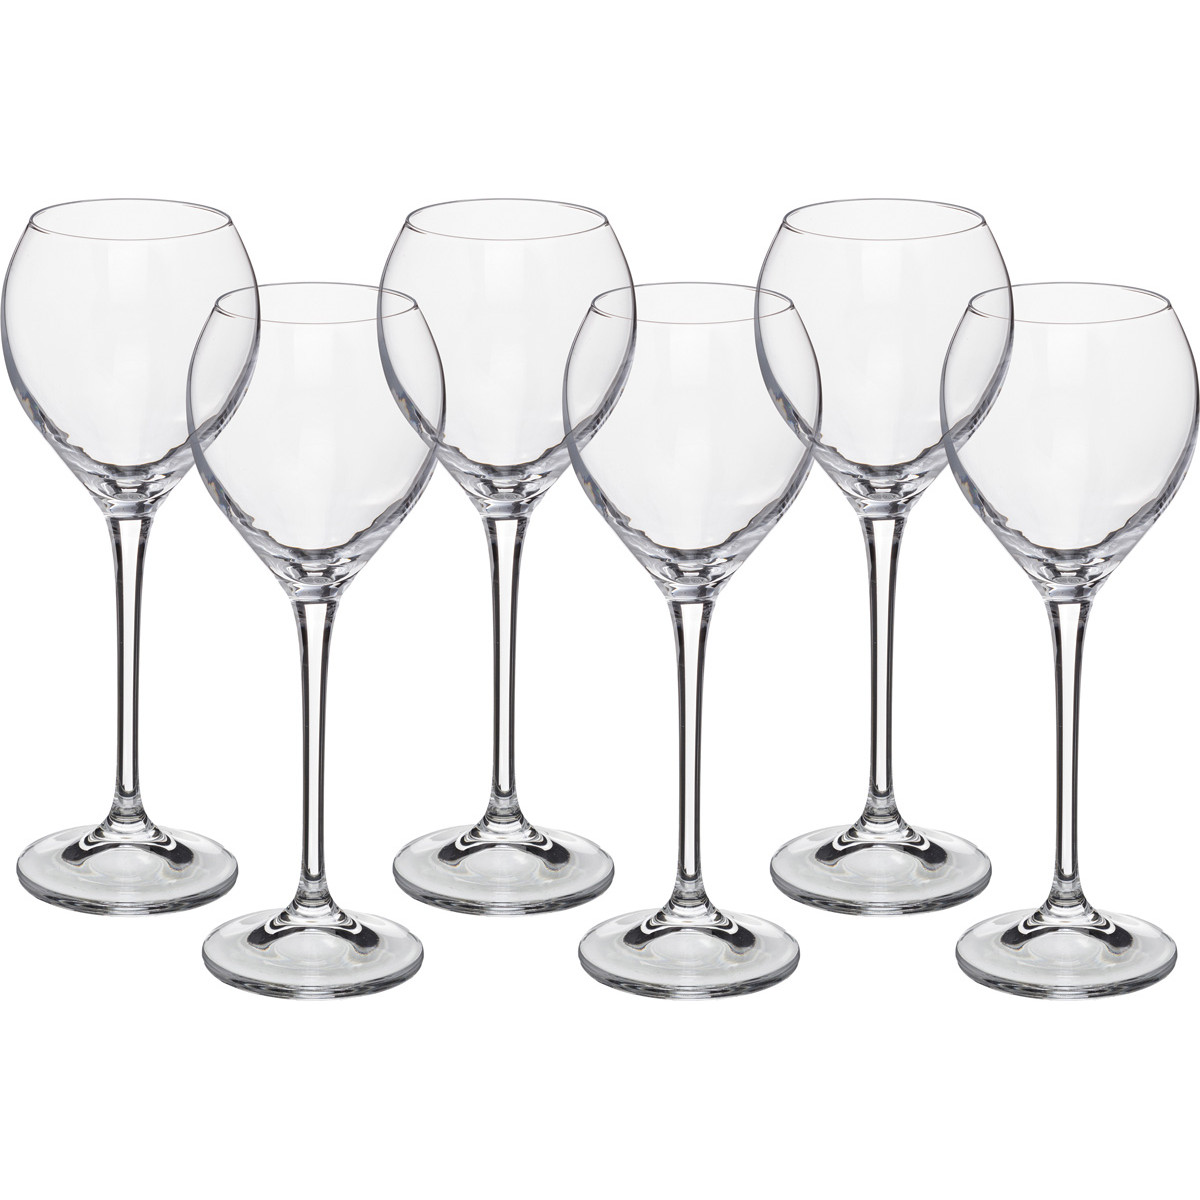 {} Crystalite Bohemia Набор бокалов для вина Nirvana (21 см - 6 шт) набор бокалов для бренди 6 шт crystalite bohemia набор бокалов для бренди 6 шт